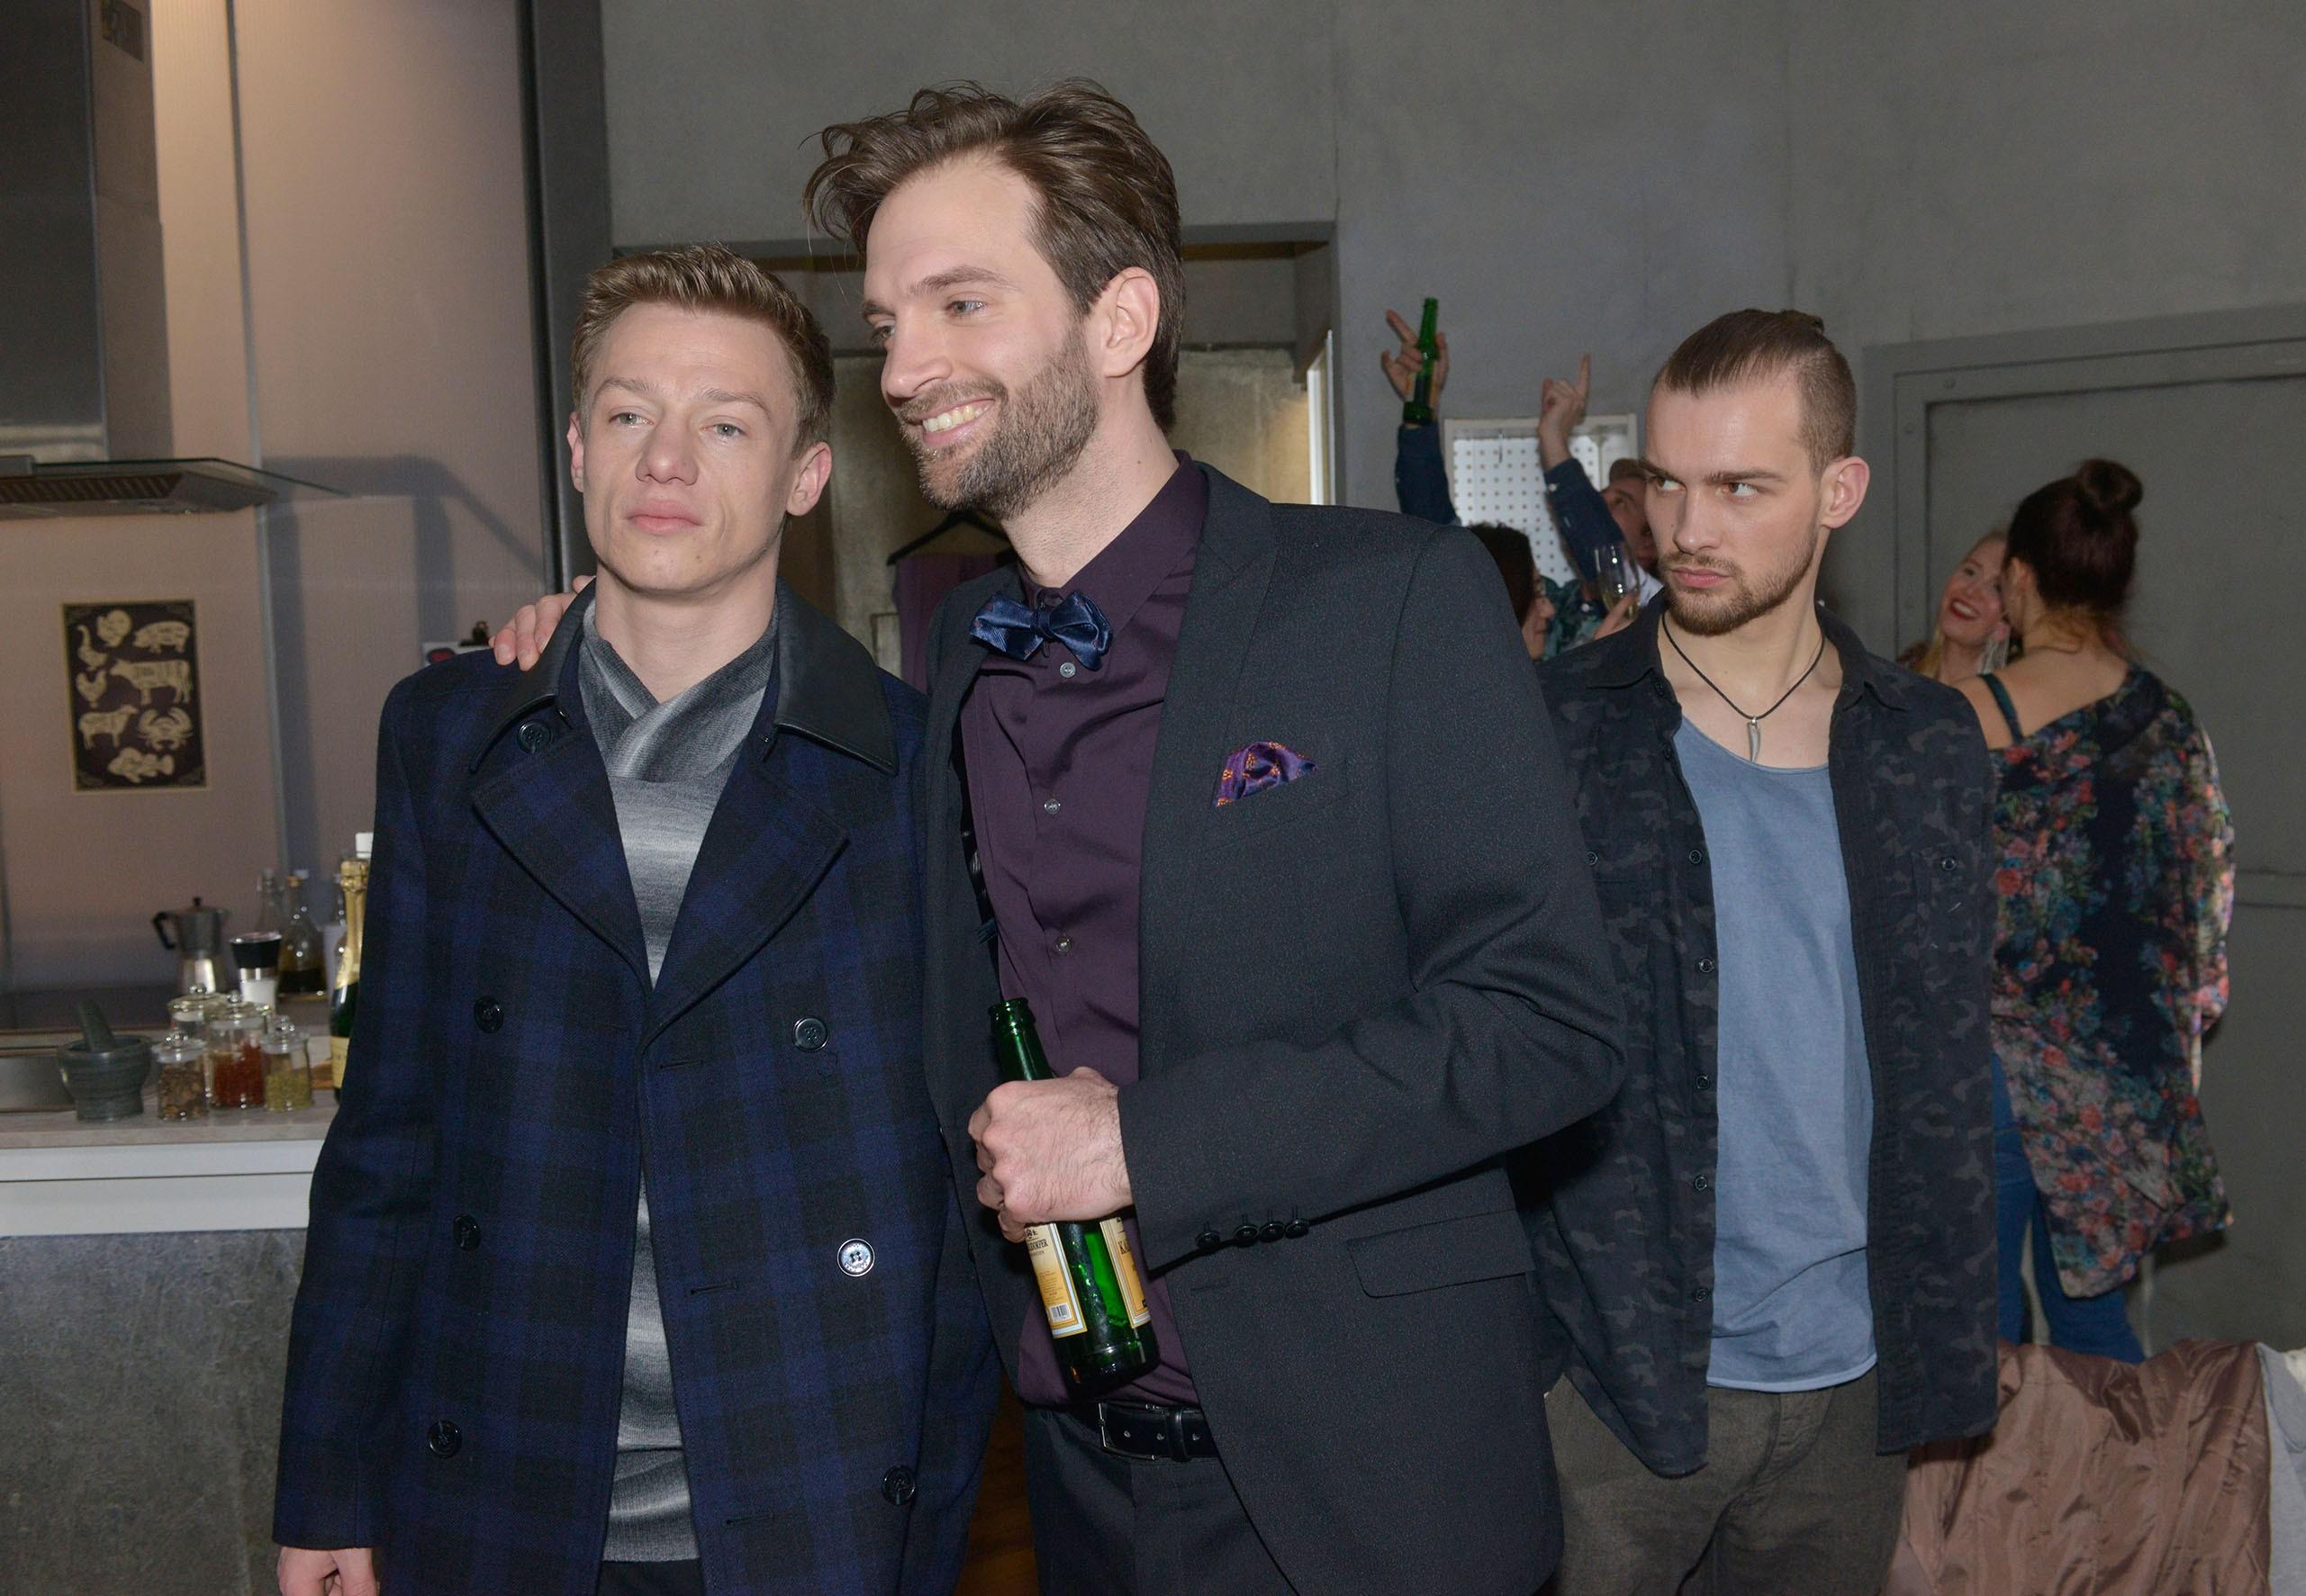 Chris (Eric Stehfest) muss befremdet erkennen, dass sich Vince (Vincent Krüger, l.) unter dem Einfluss von Julius (Benjamin Bieber) zunehmend verändert.